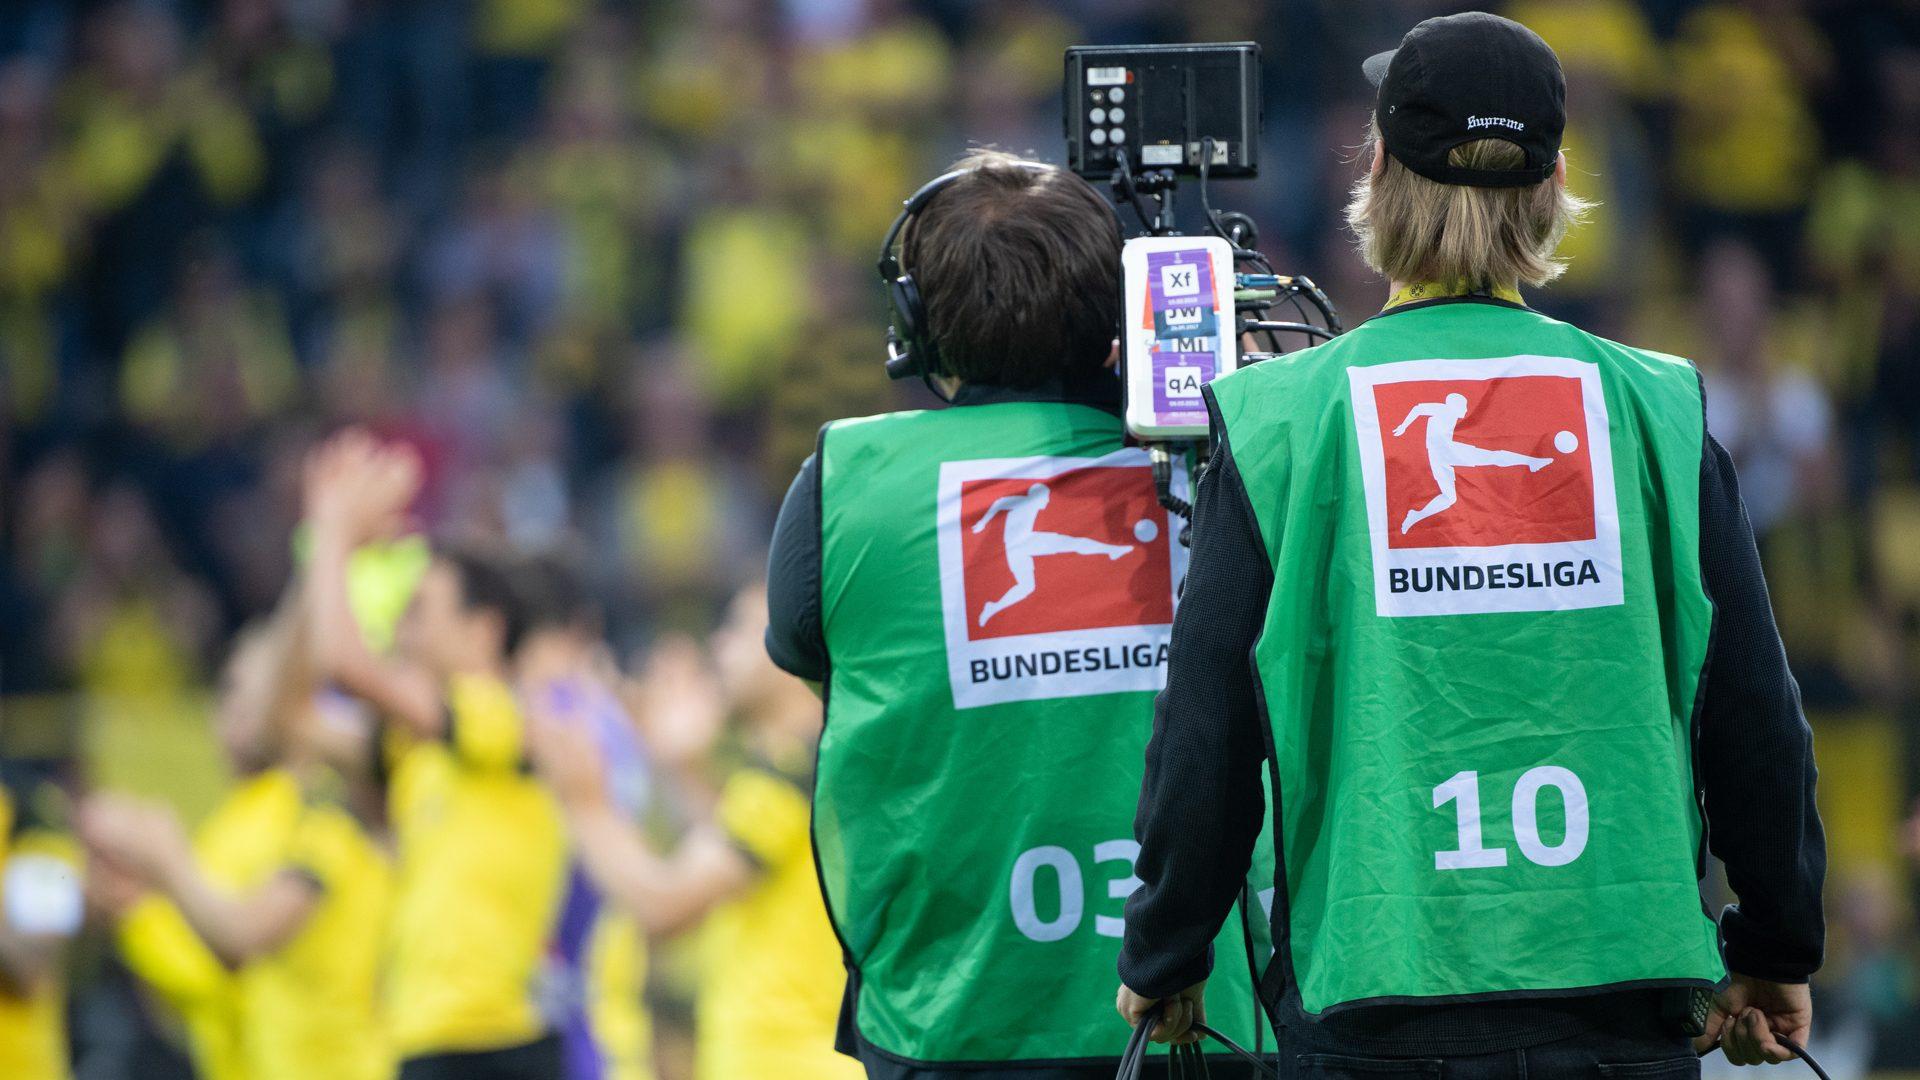 Bundesliga Watch Bundesliga Live In The Usa What Channel Is The German Top Flight On Fox Sports Tudn Fubotv Unimas Schedules